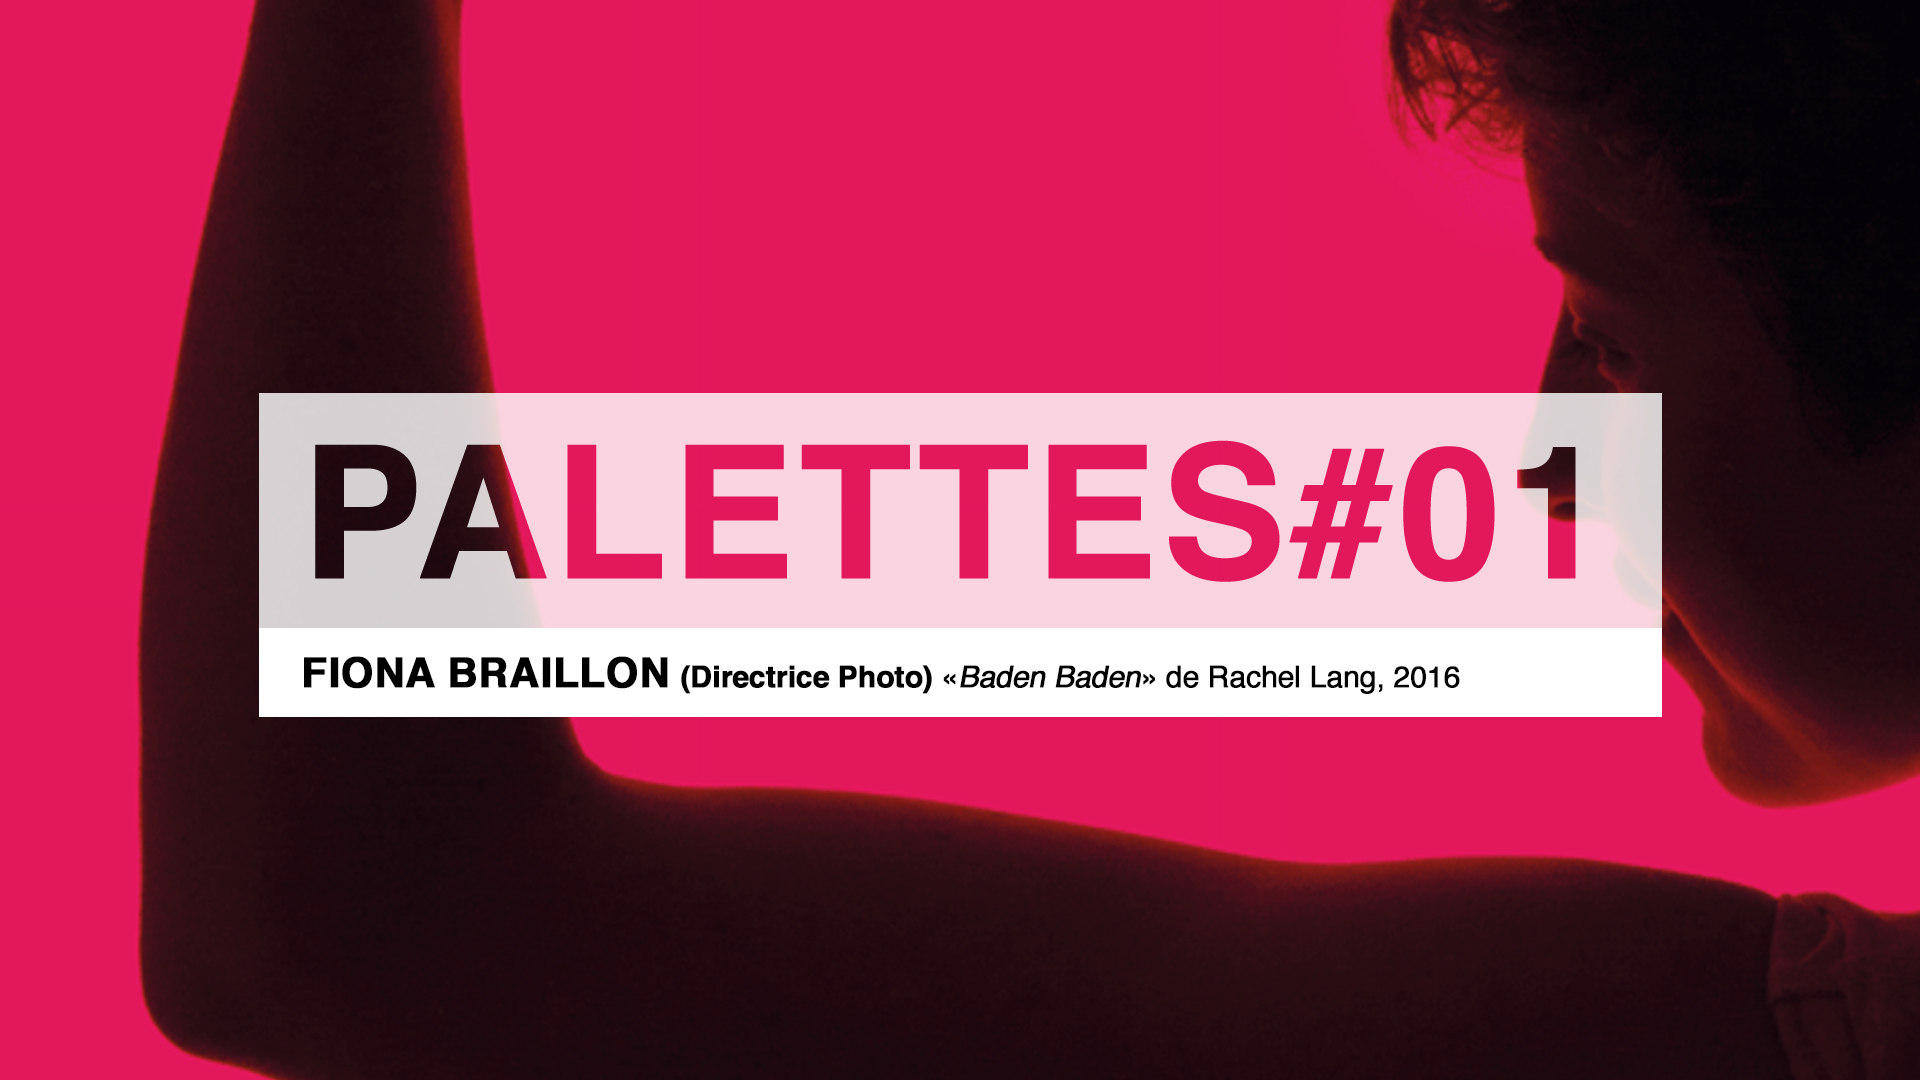 Palettes-Fiona-Braillon-Baden-Baden Header